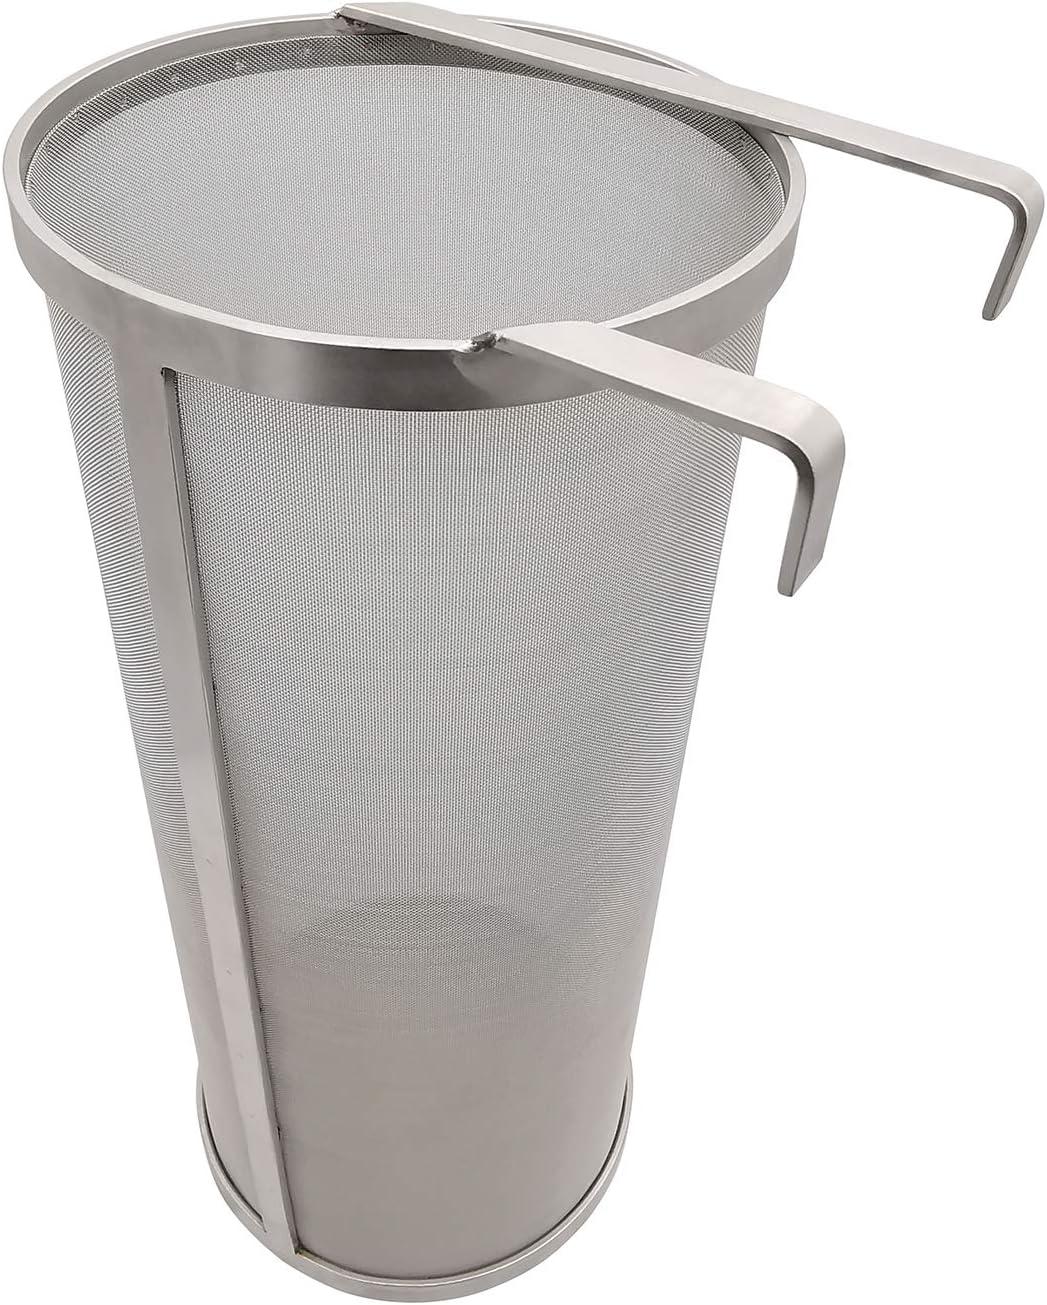 "Hop Hopper Spider Strainer Basket Filter for Homebrew Hops Beer & Tea Brewing Bucket Fermenter Kettle, 304 Stainless Steel 300 Micron Mesh - 6"" x 14"""